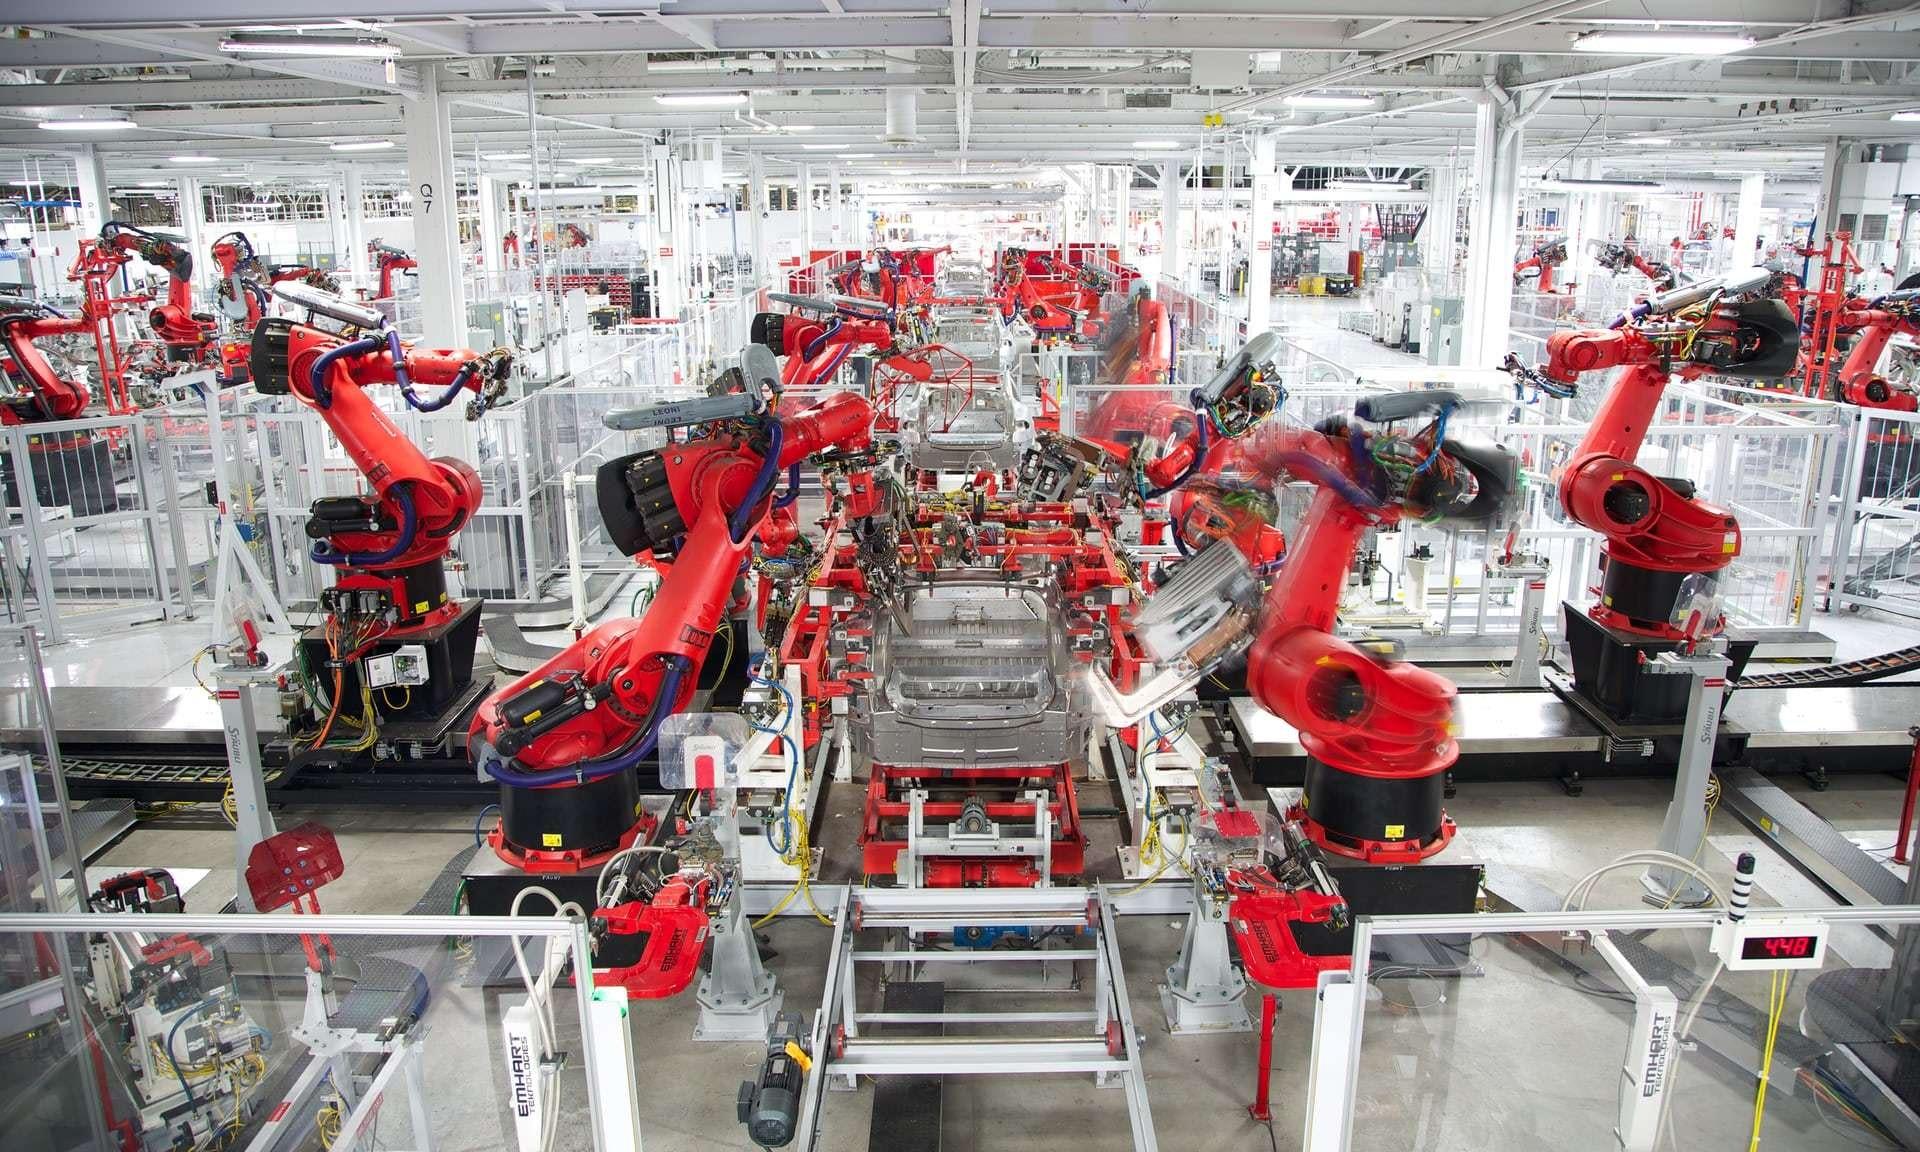 Tesla Reportedly Smashes Factory Records as Elon Musk Teases Profitability